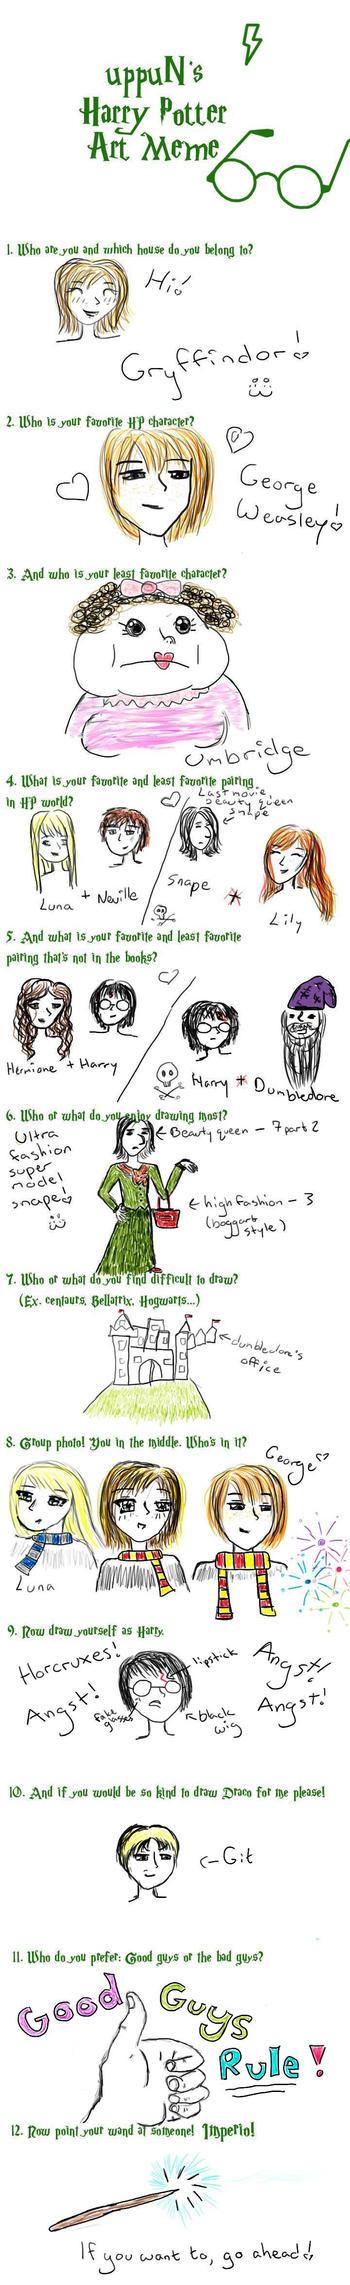 HP meme by GryffindorGurl